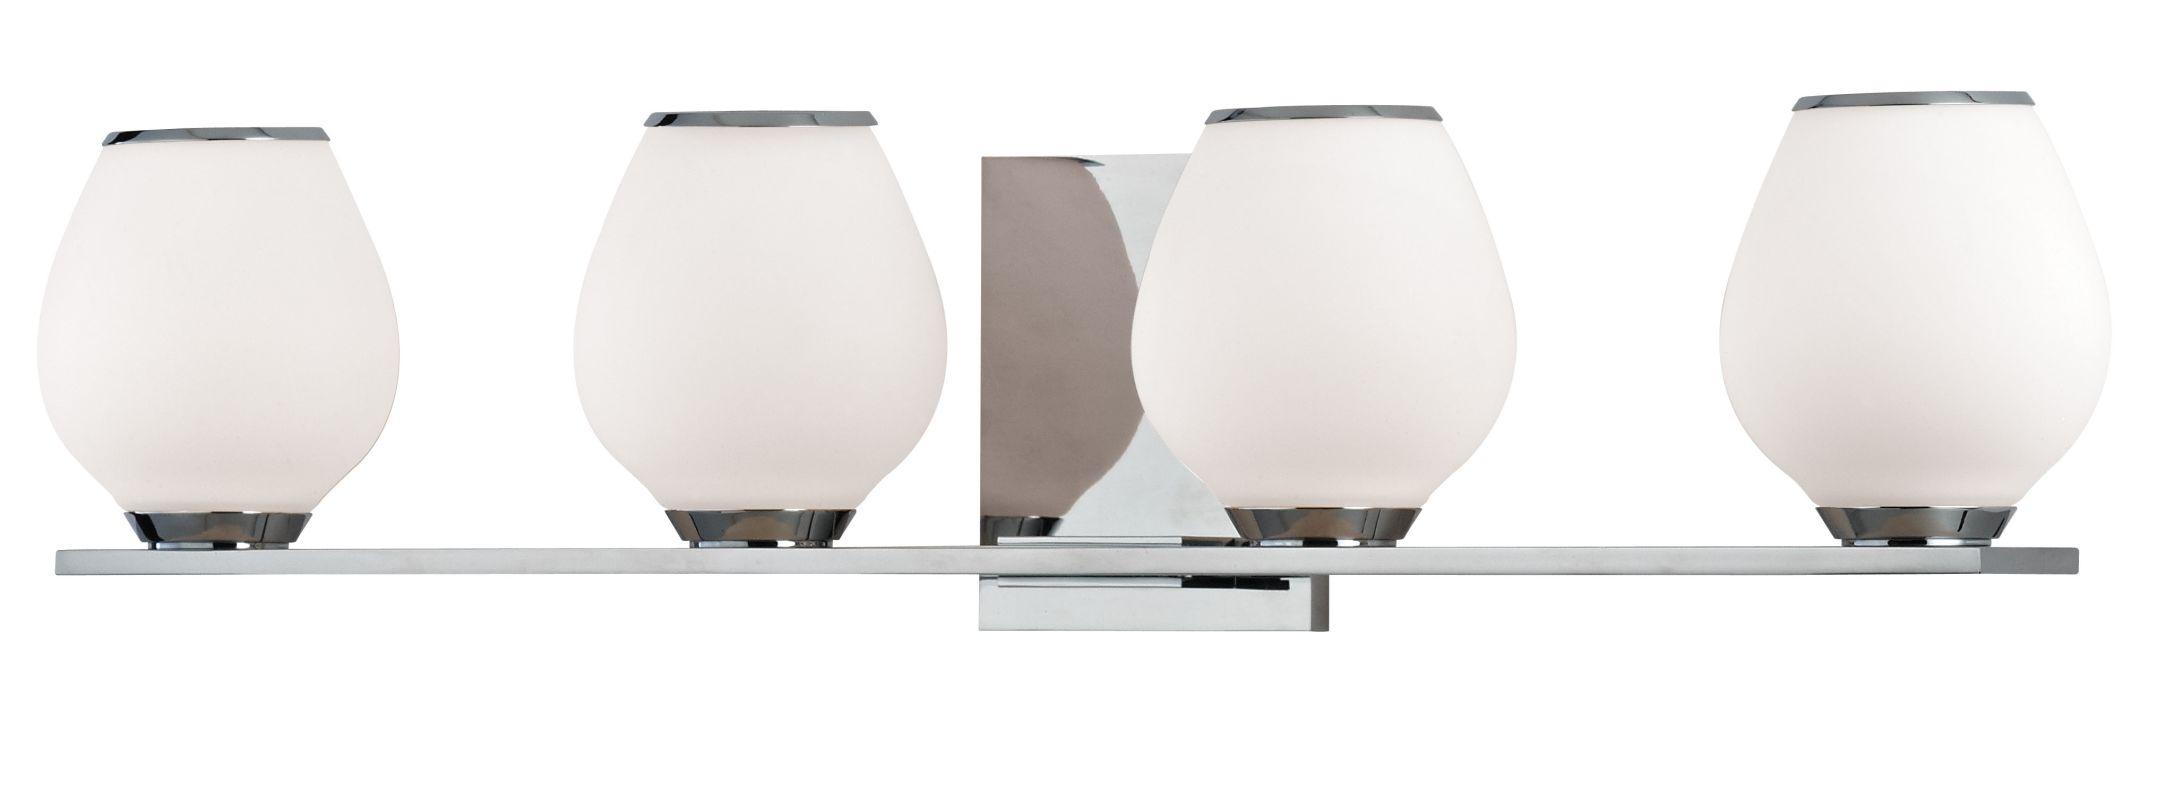 Hudson Valley Lighting 1194 Verona 4 Light Xenon Bathroom Vanity Light Sale $193.60 ITEM#: 2295067 MODEL# :1194-PC UPC#: 806134158897 :